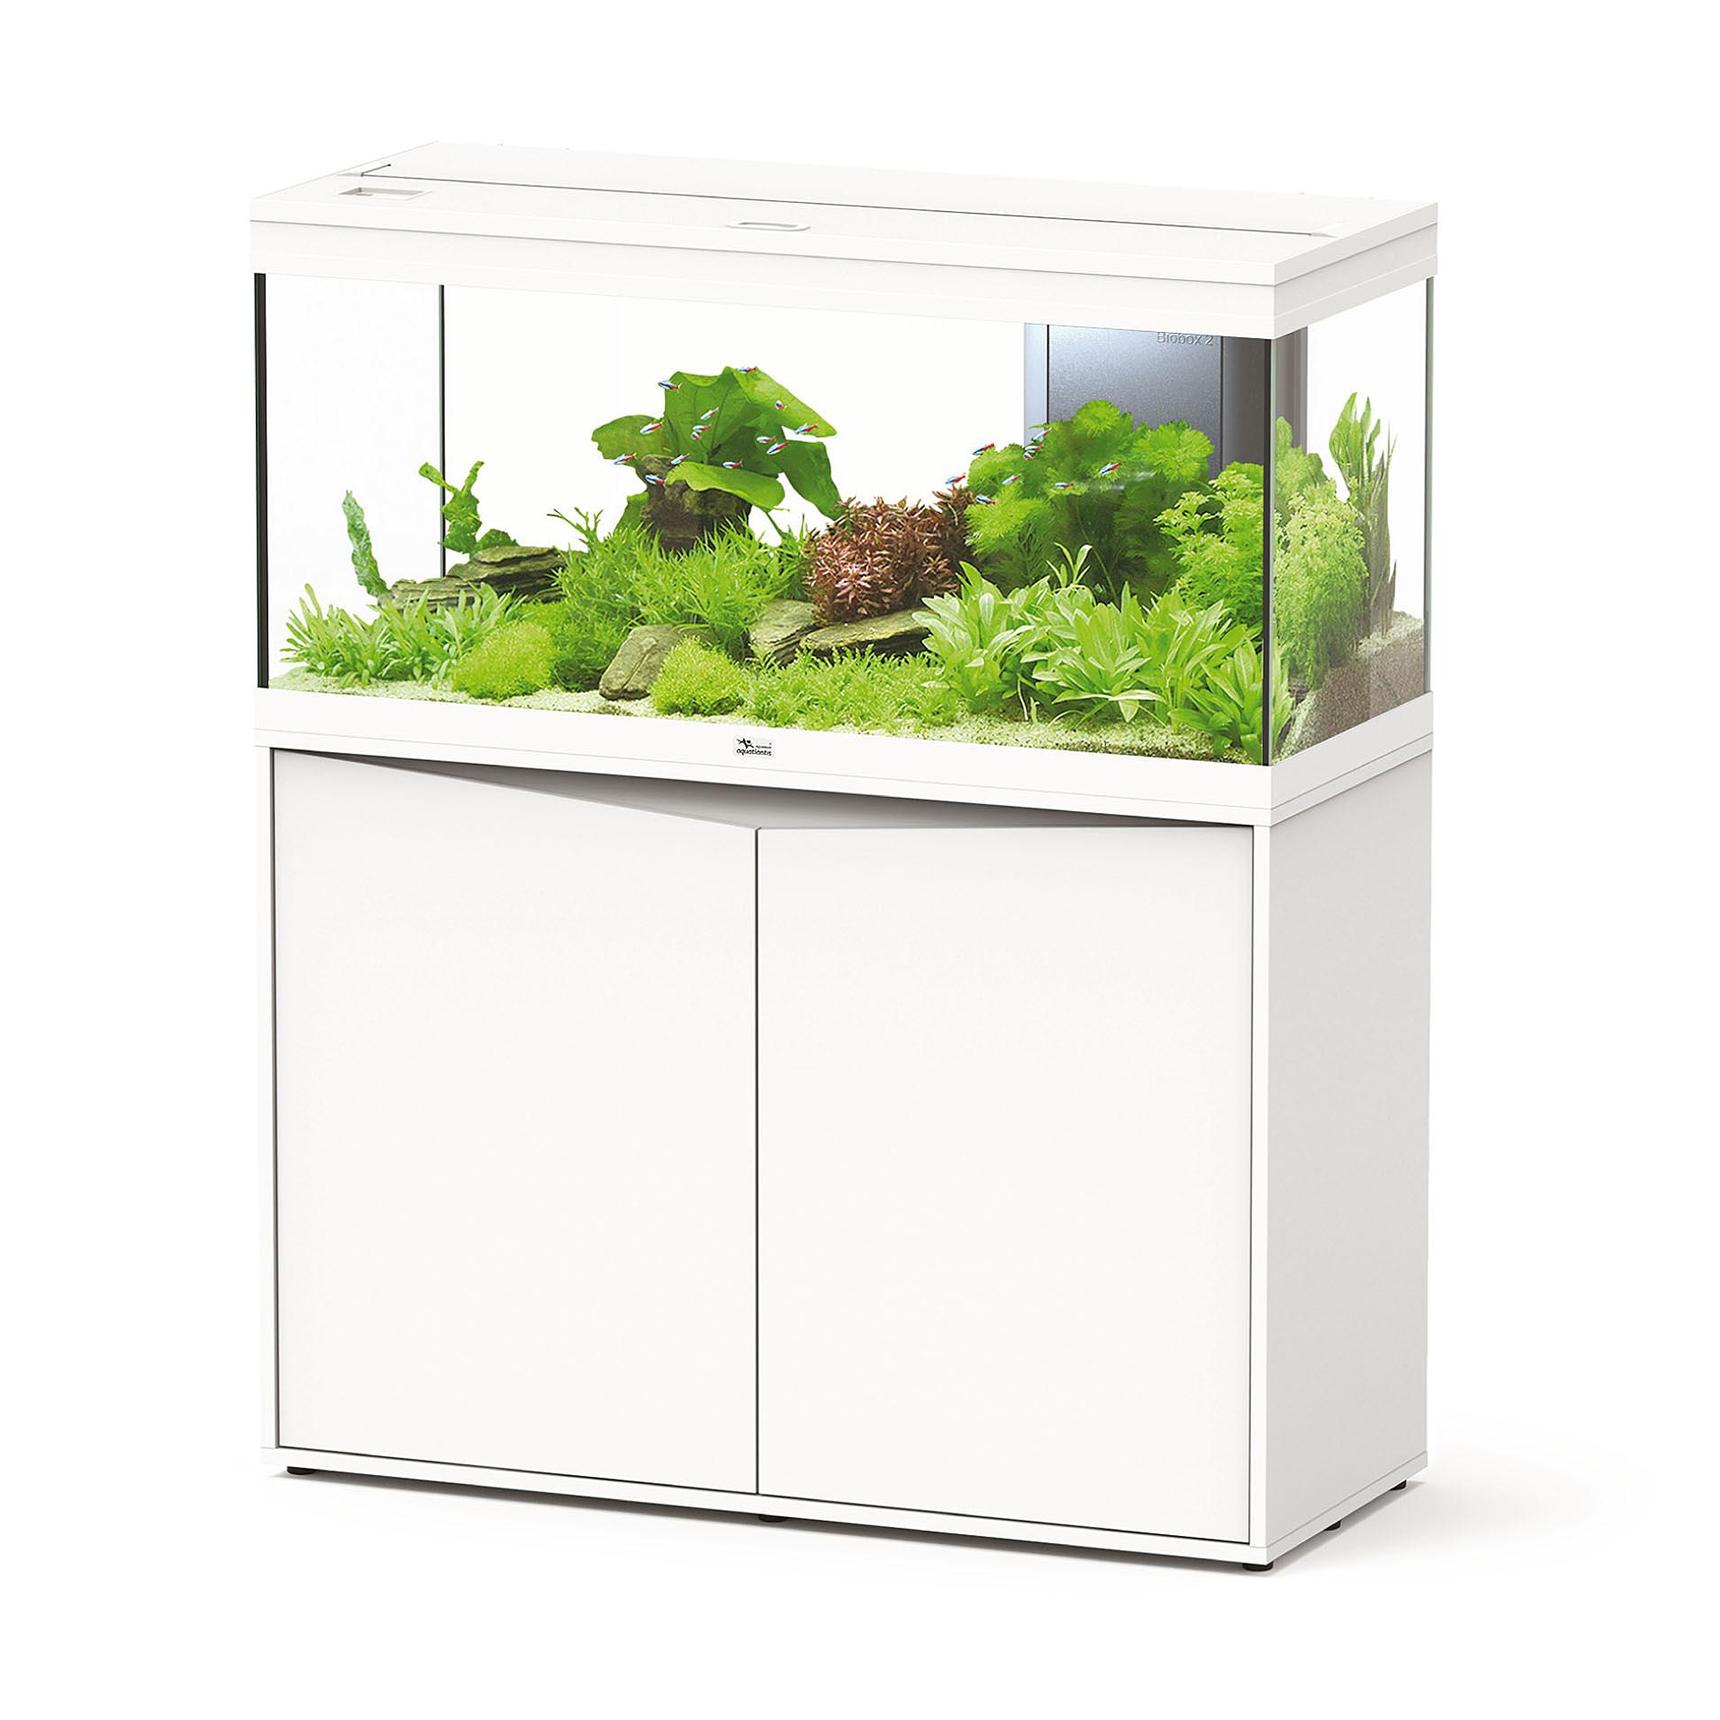 aquatlantis aquarium set volga 180 weiss